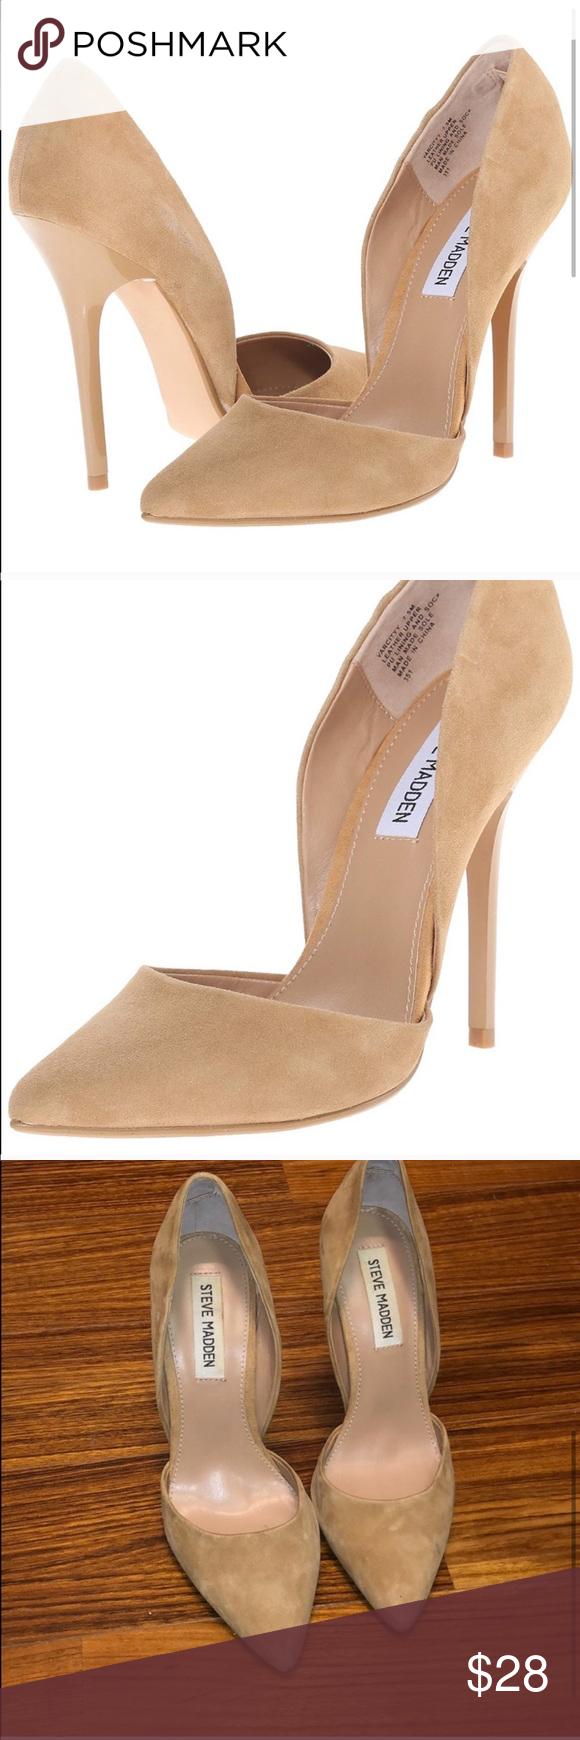 Óxido huella dactilar desconcertado  Steve Madden Varcitty D'Orsay Suede Pump | Shoes women heels, Suede pumps,  Pumps